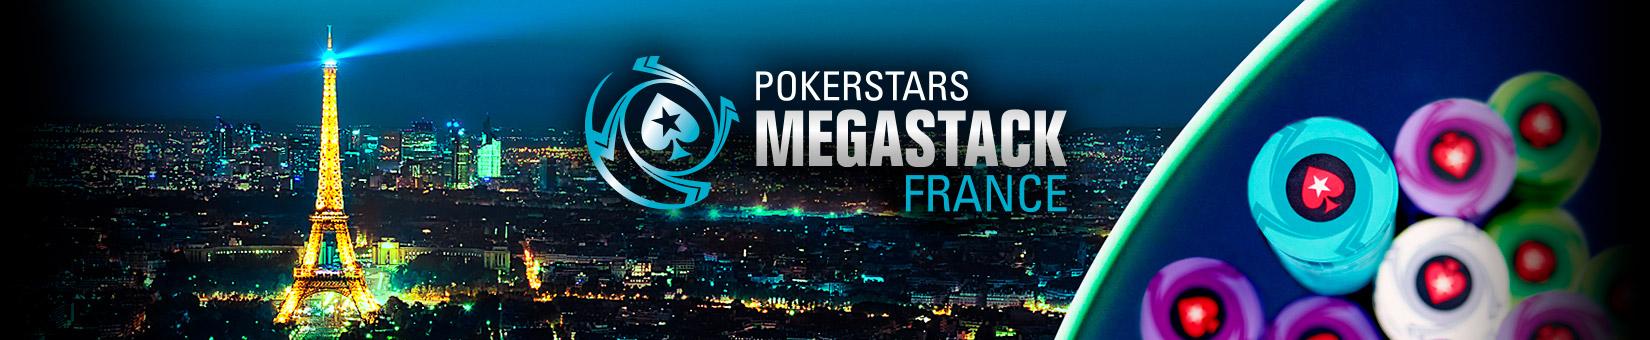 PokerStars MEGASTACK Франция